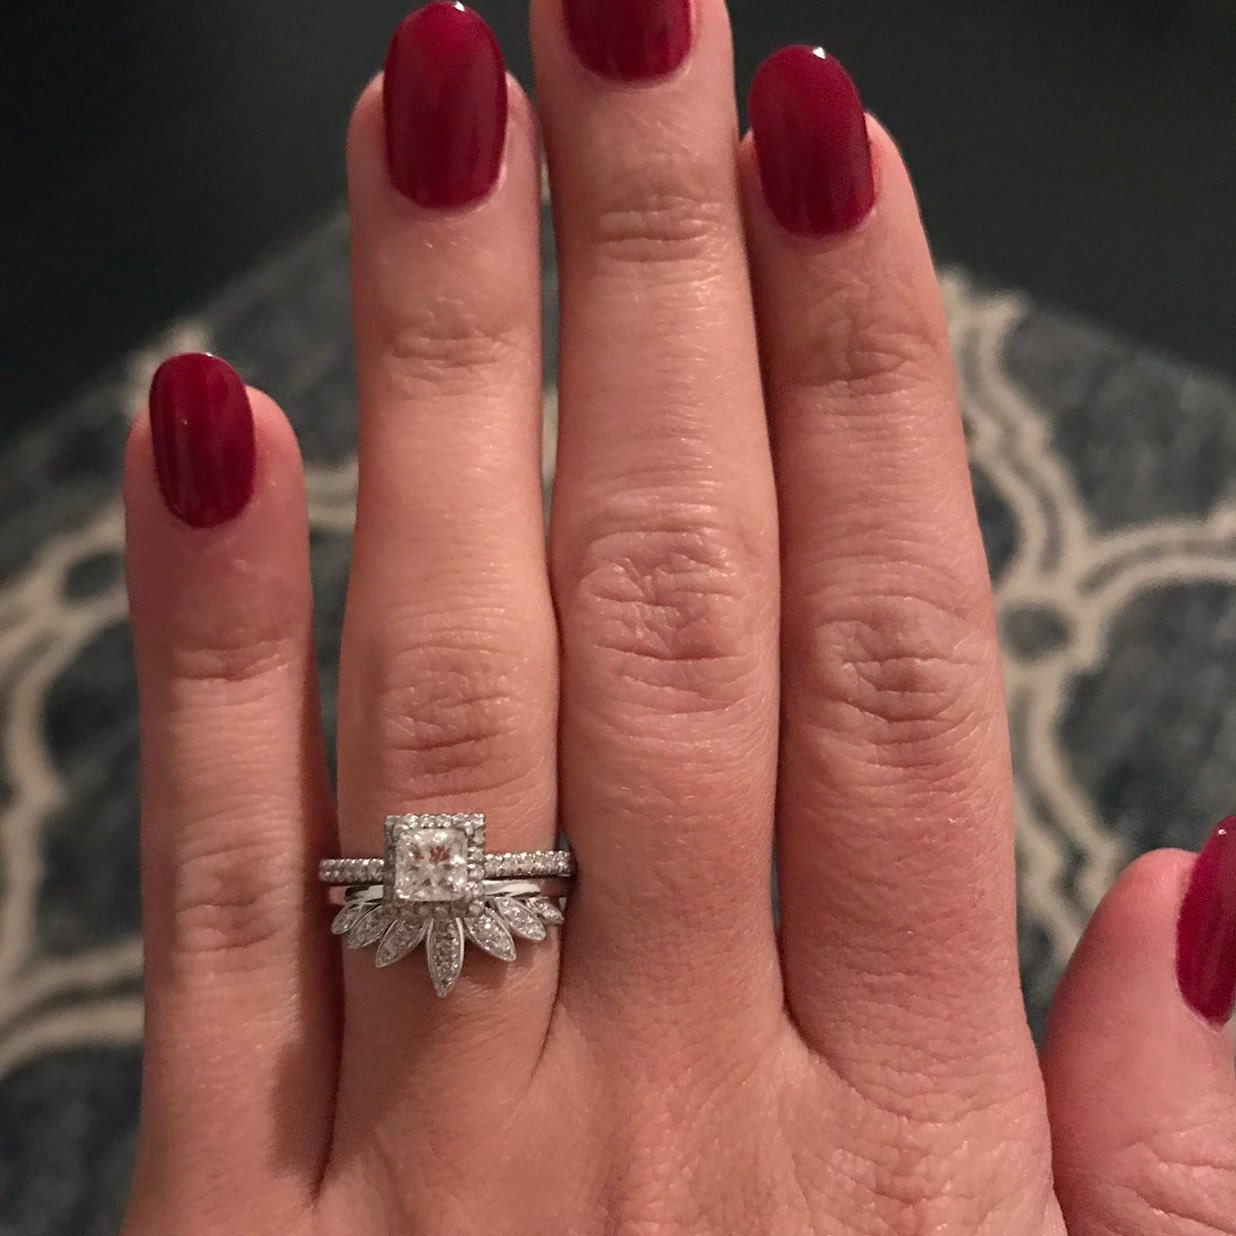 Rachel Dennison added a photo of their purchase